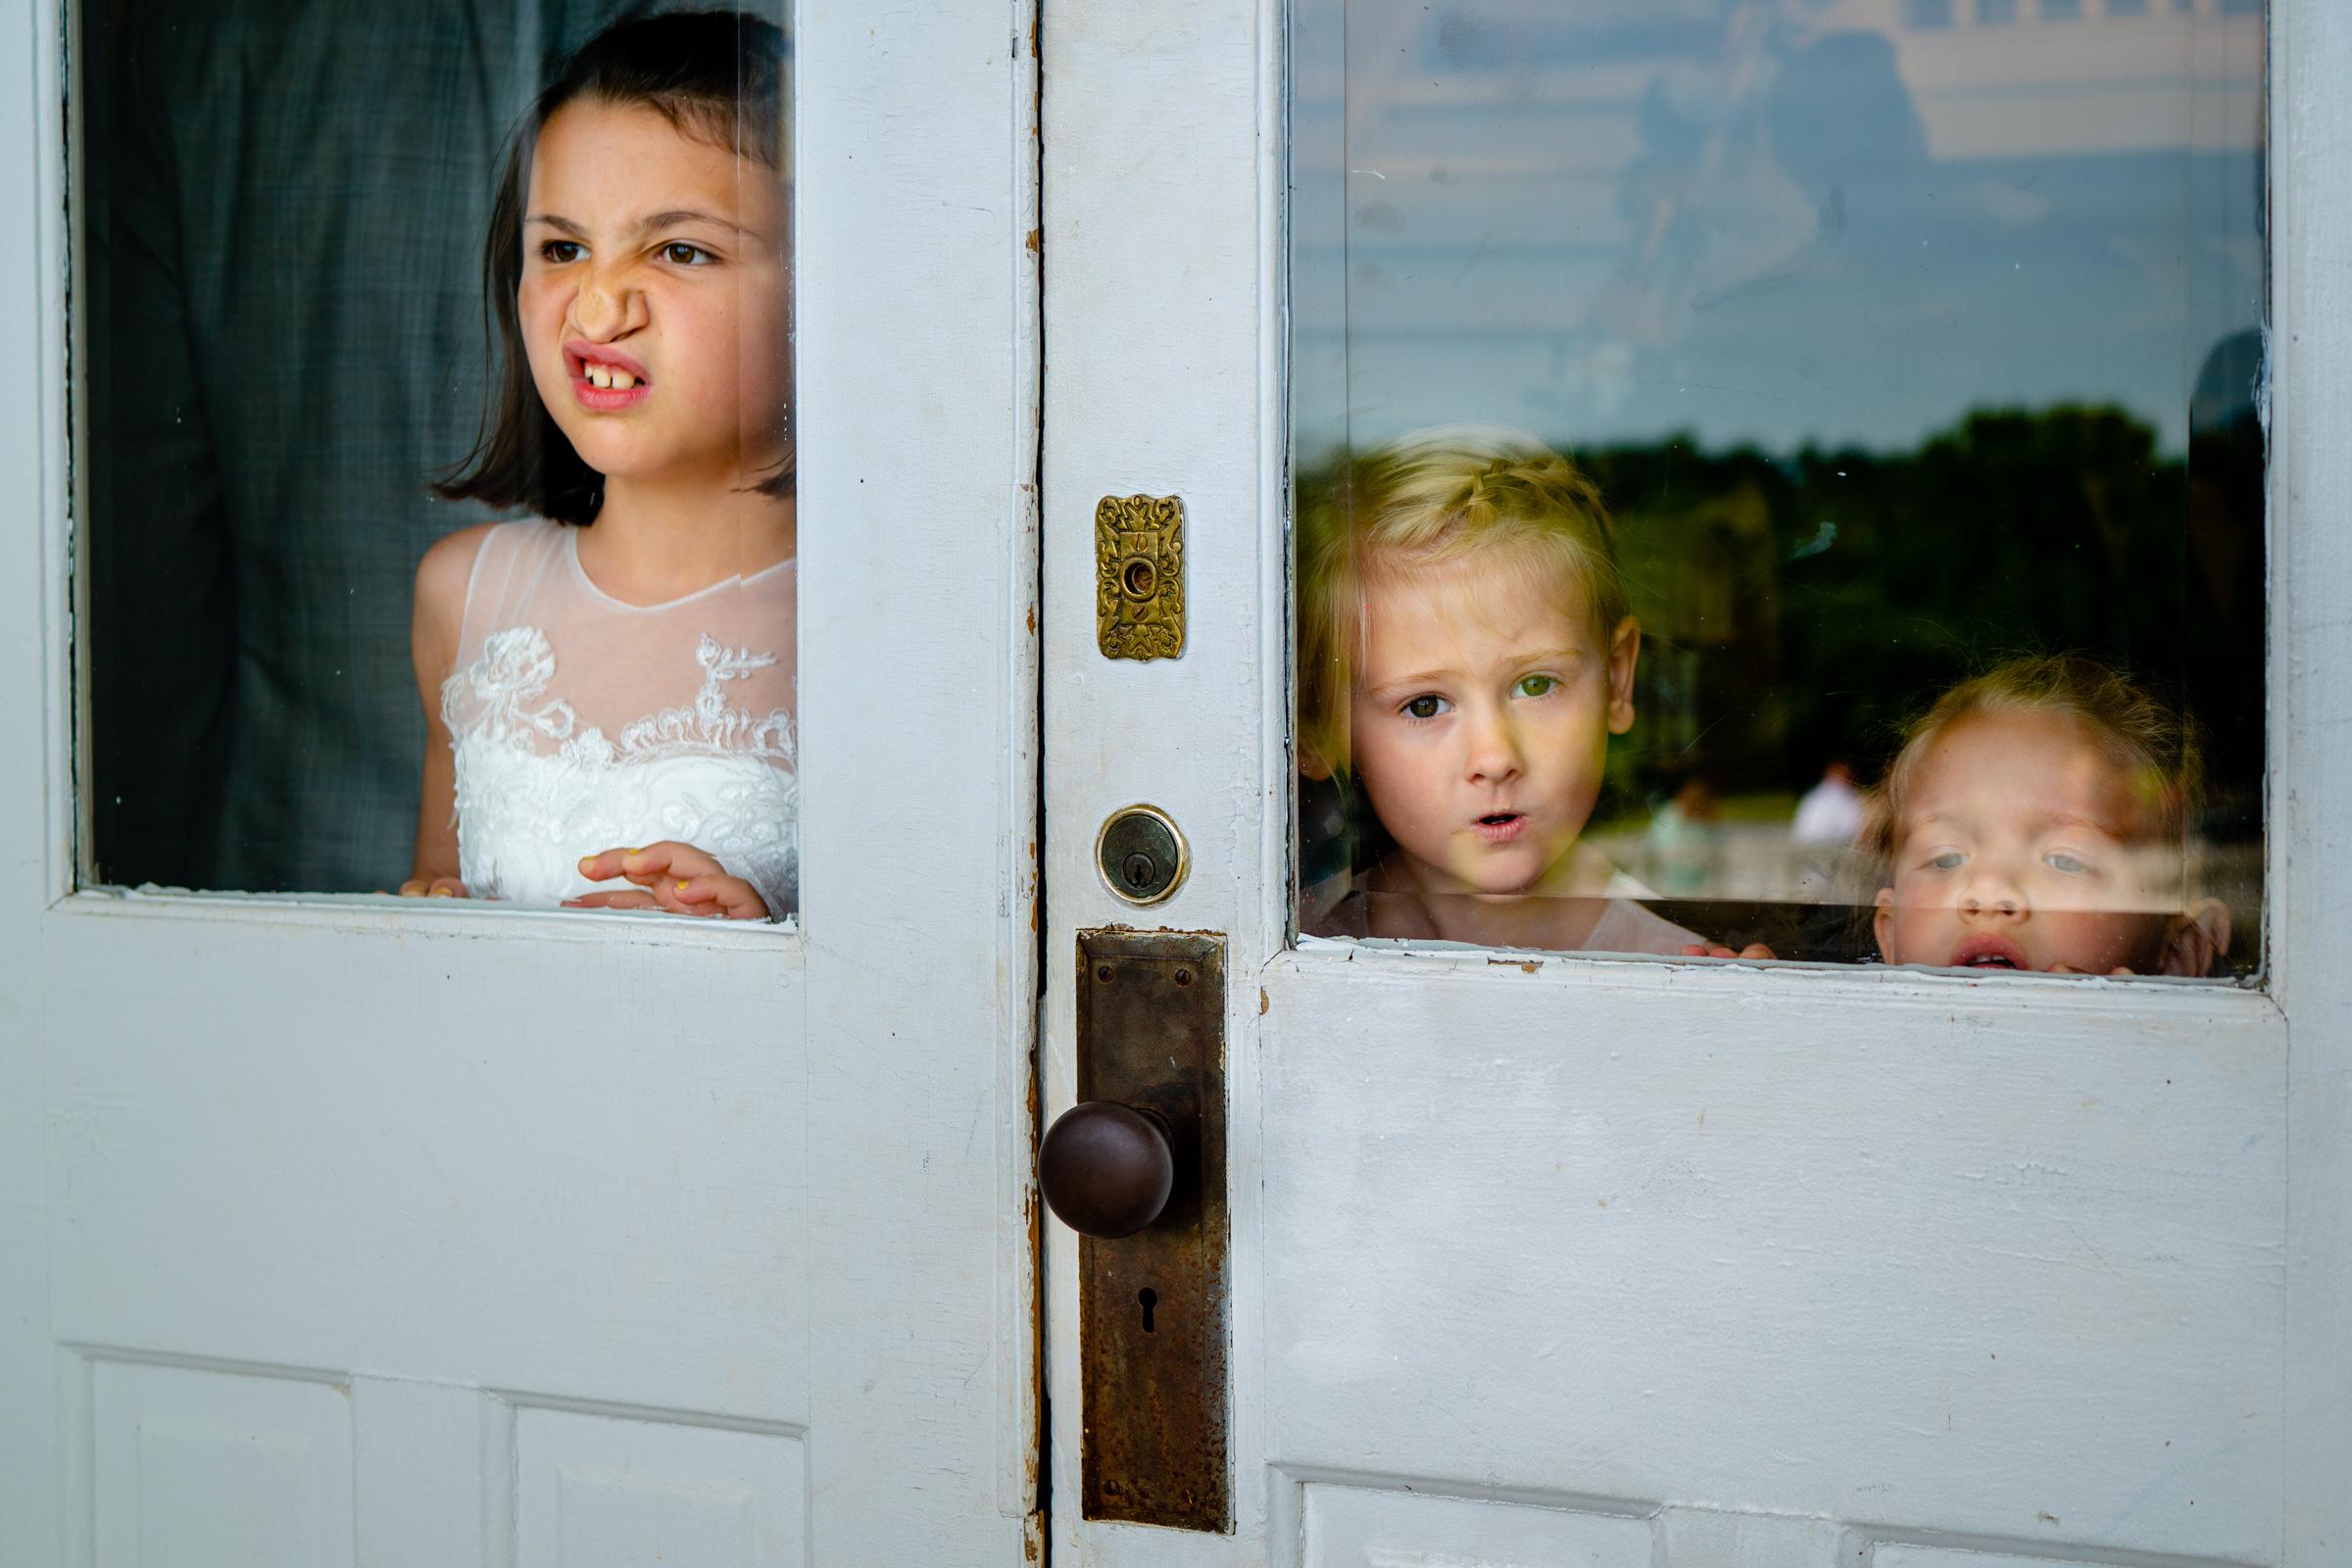 Kids looking through glass door photo by Bee Two Sweet